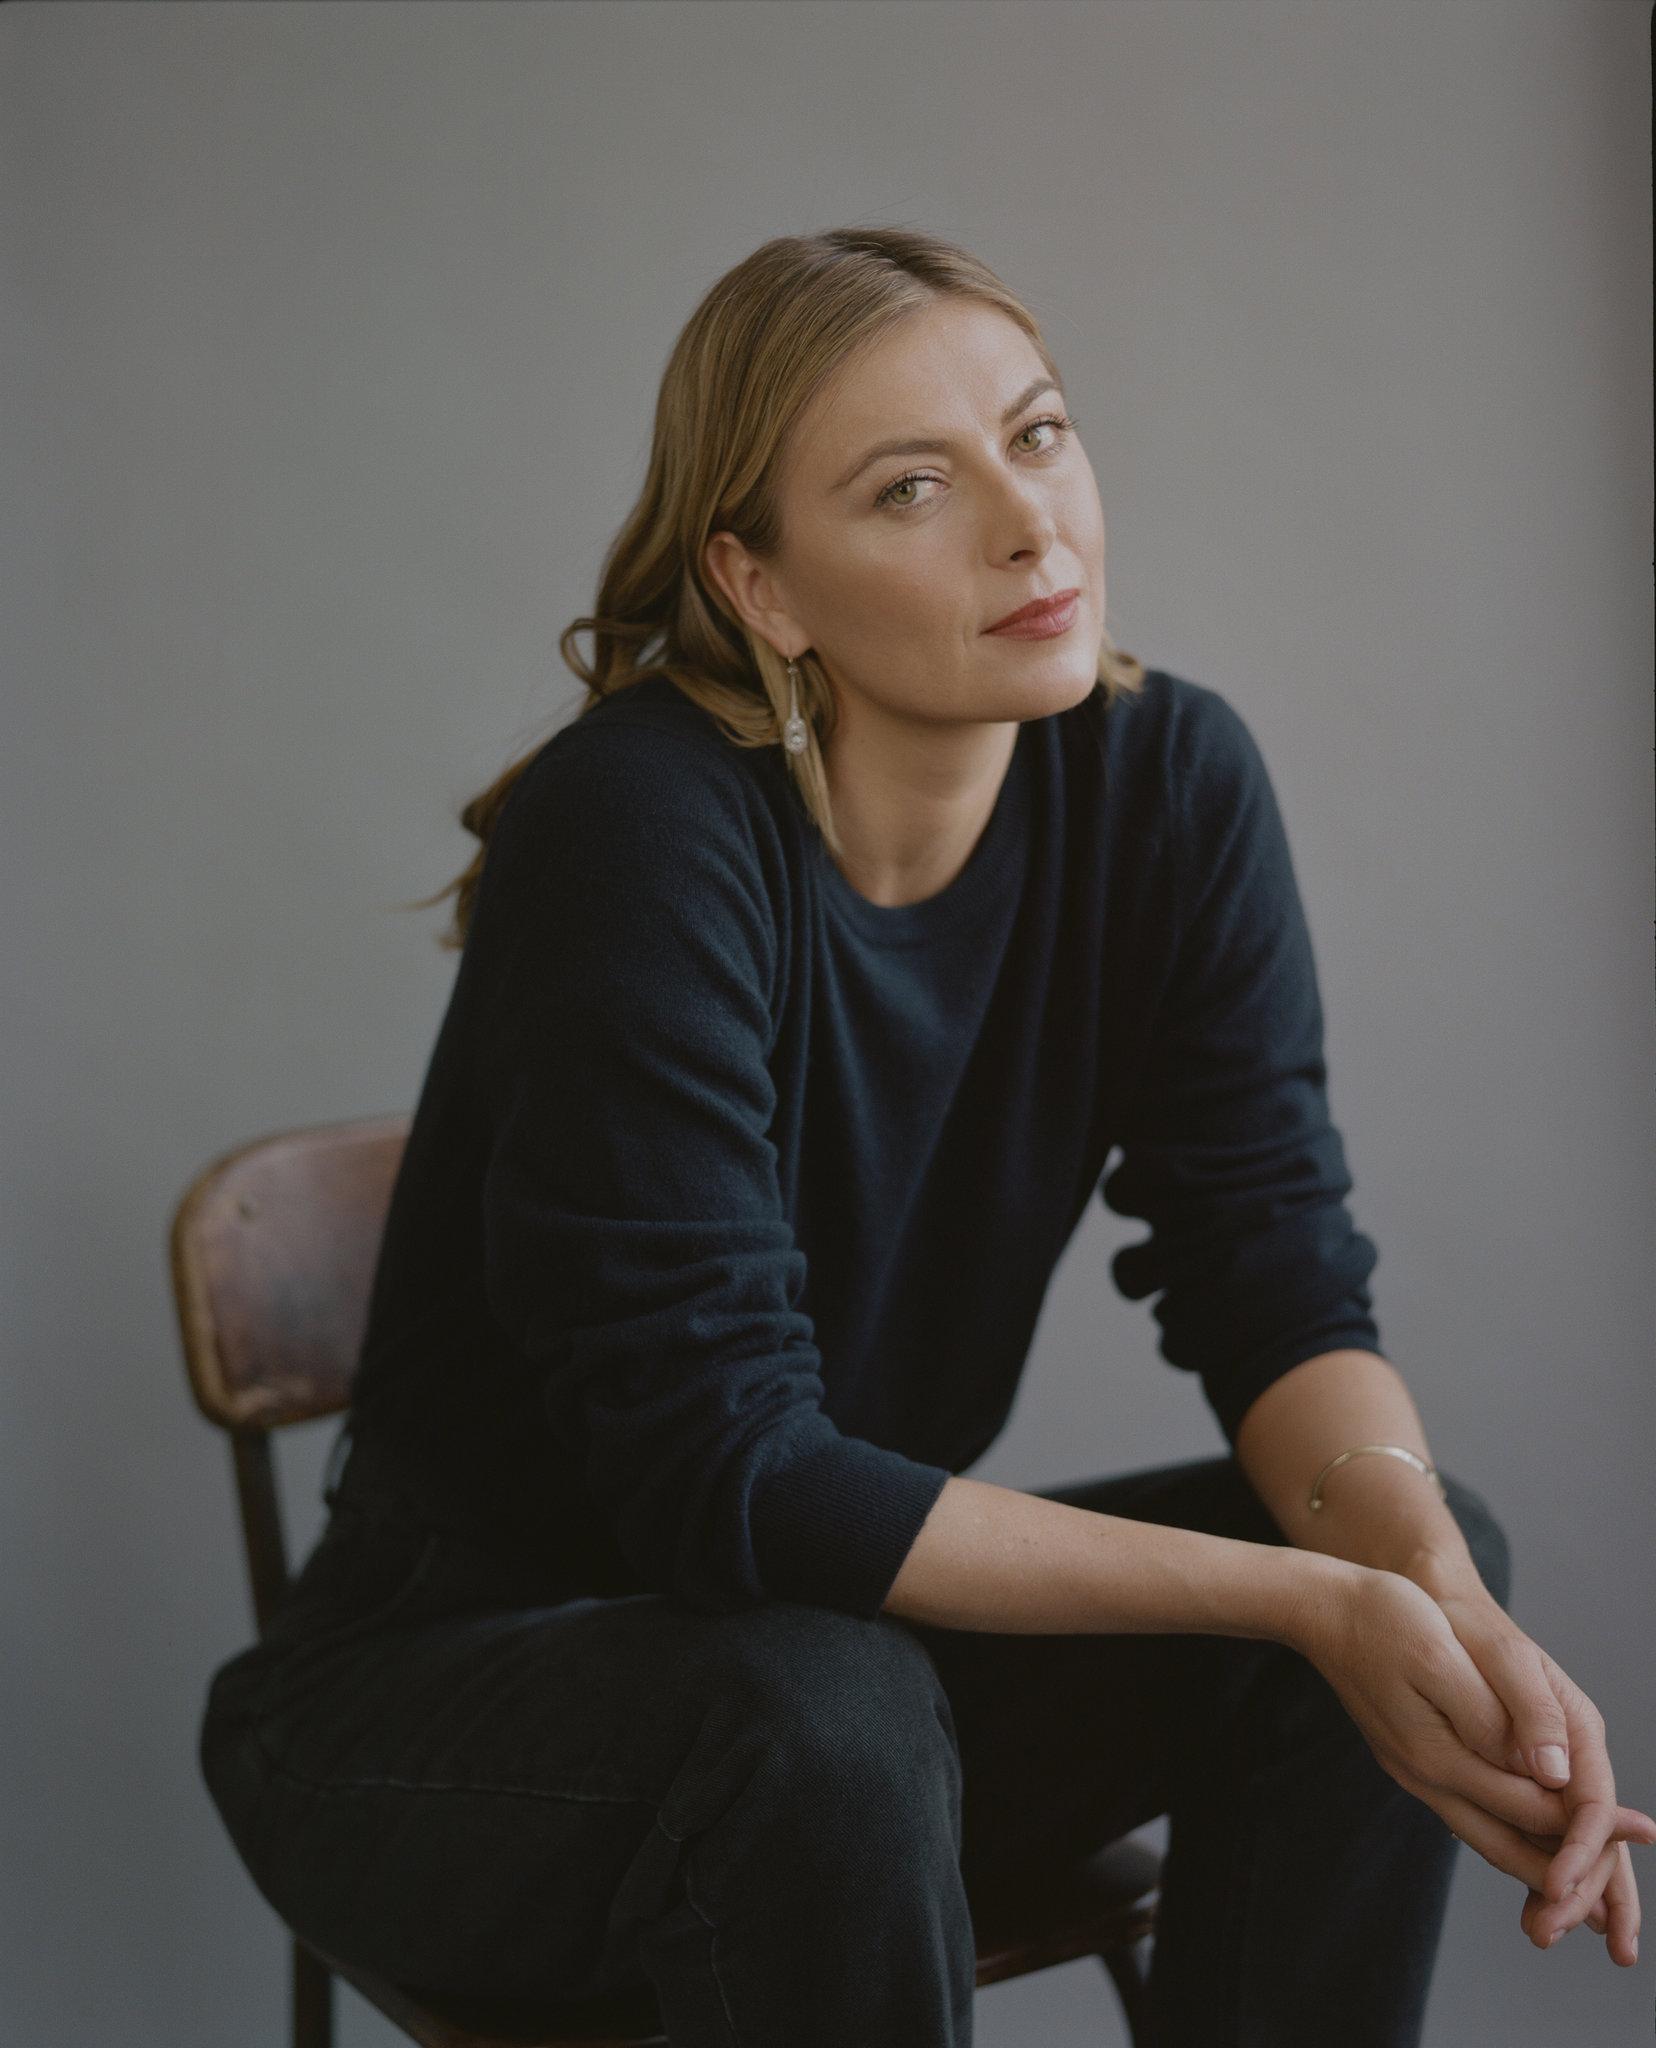 Celeste Sloman Photographs Maria Sharapova for The New York Times